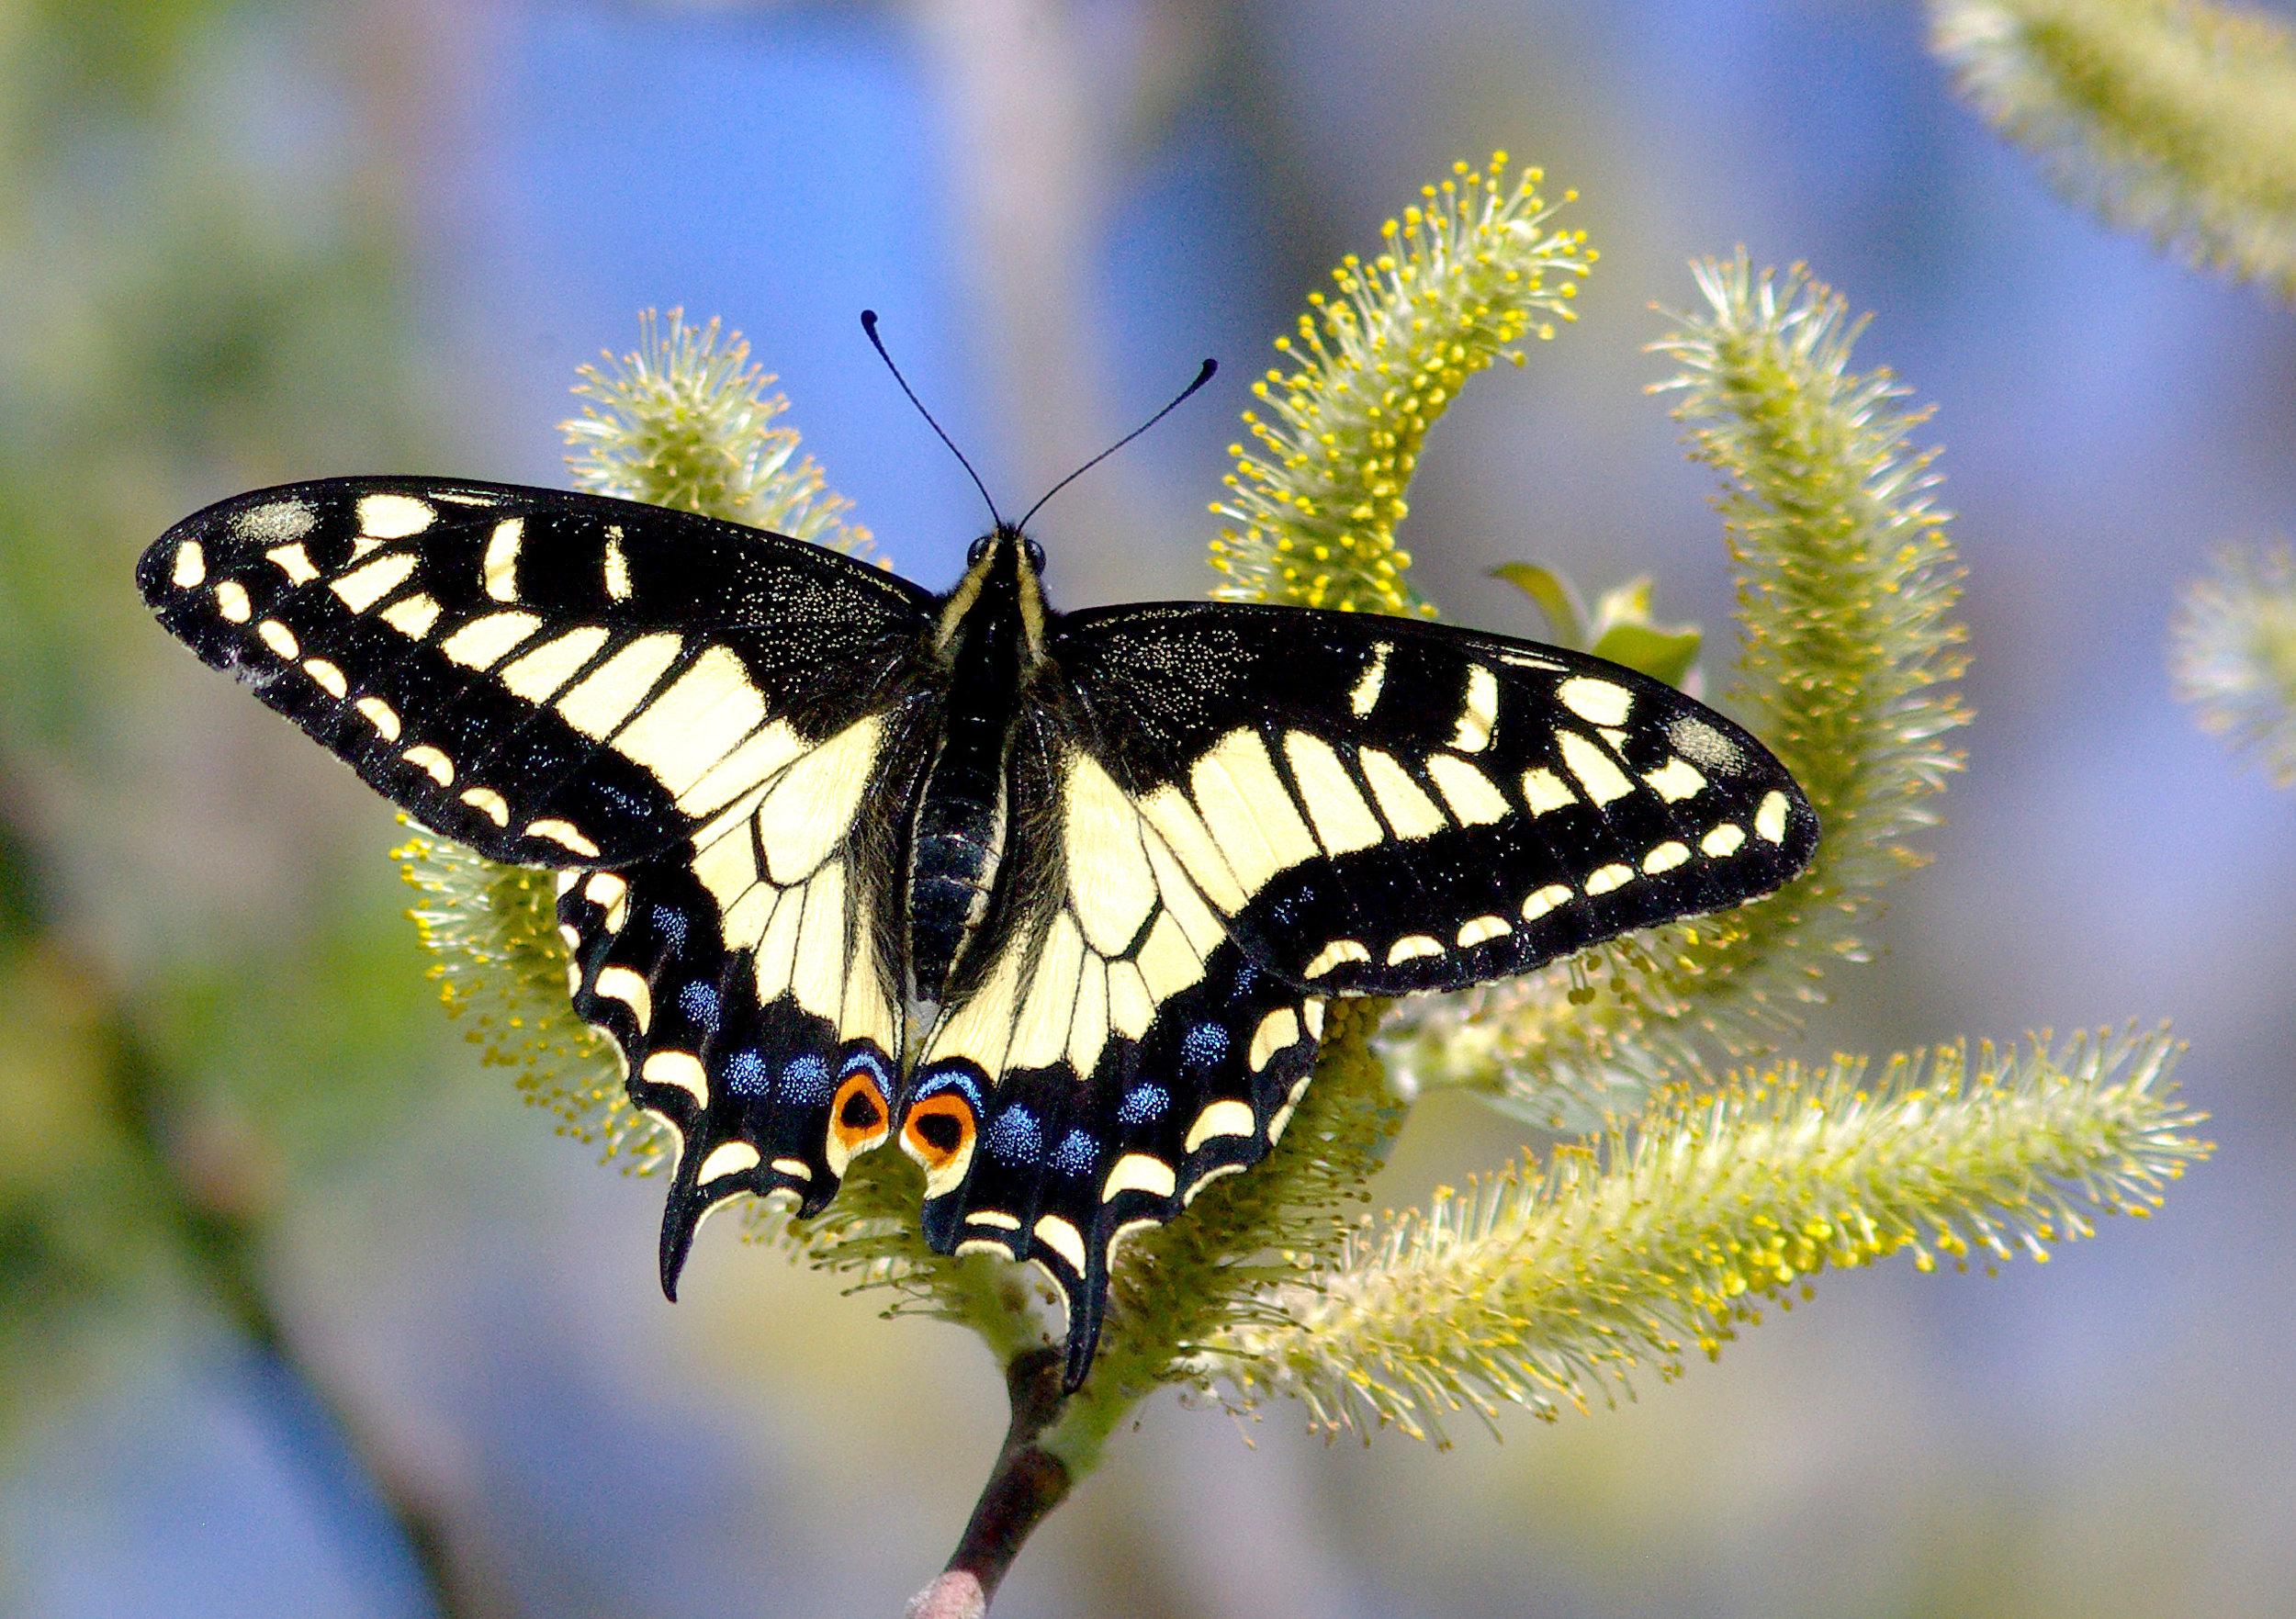 An Anise Swallowtail Butterfly. Photo courtesy of Alan Schmierer, via Wikimedia Creative Commons, CCO 1.1 Universal Public Domain Dedication.